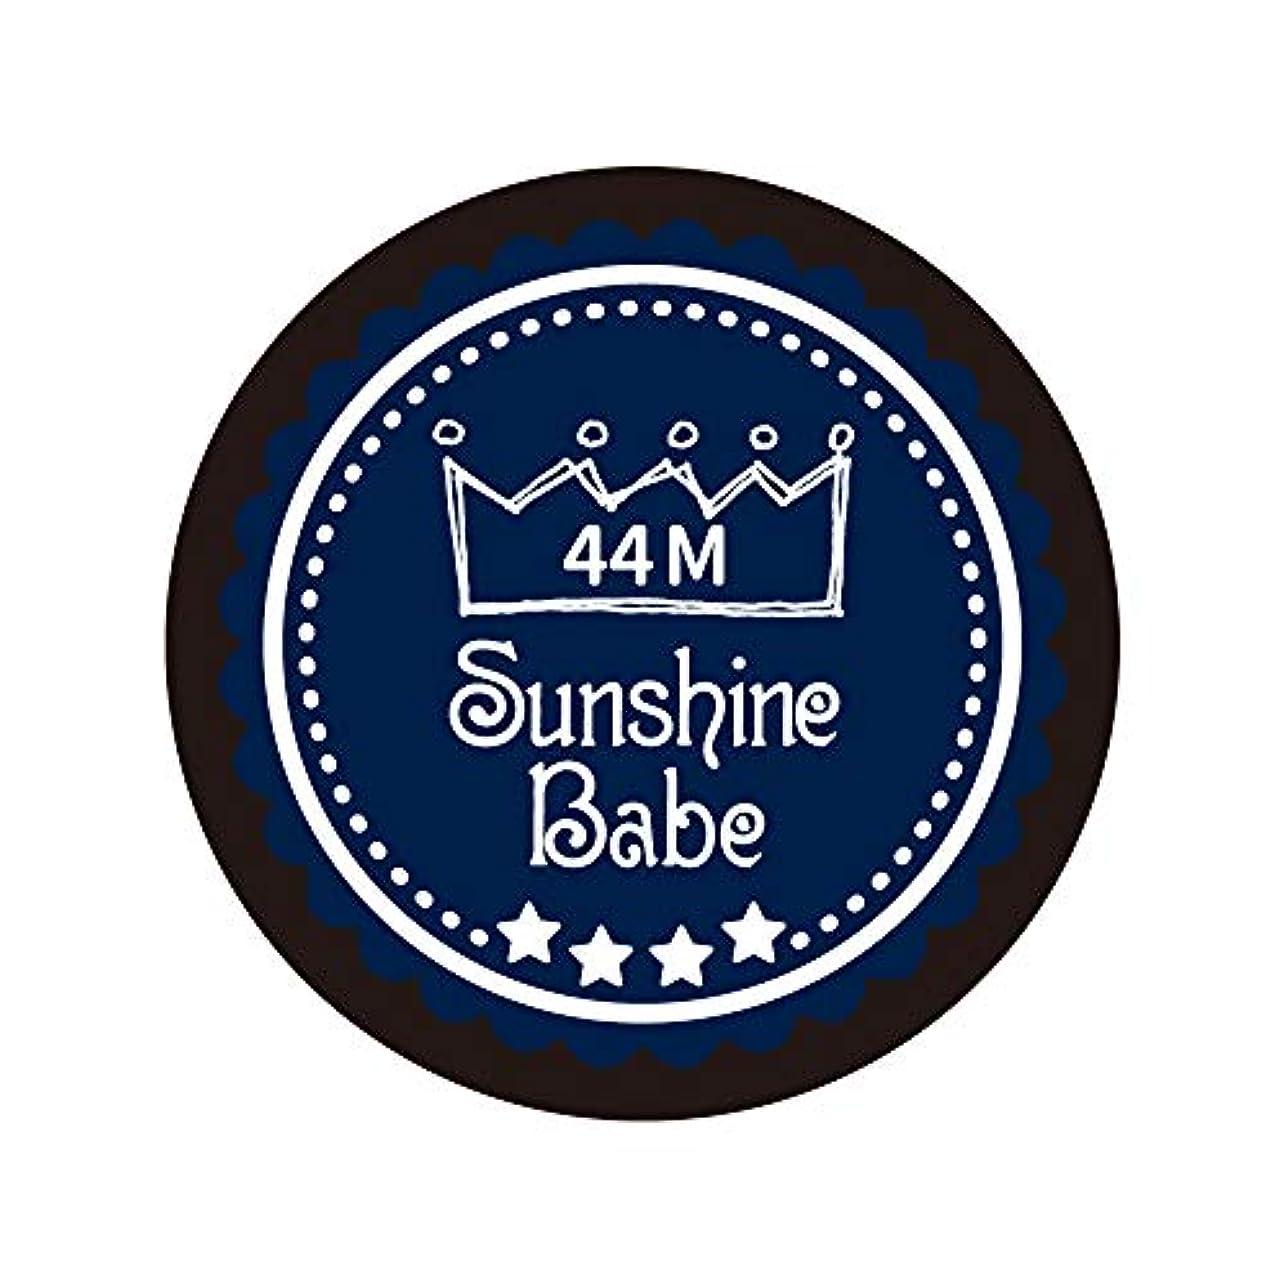 Sunshine Babe カラージェル 44M クラシックネイビー 2.7g UV/LED対応